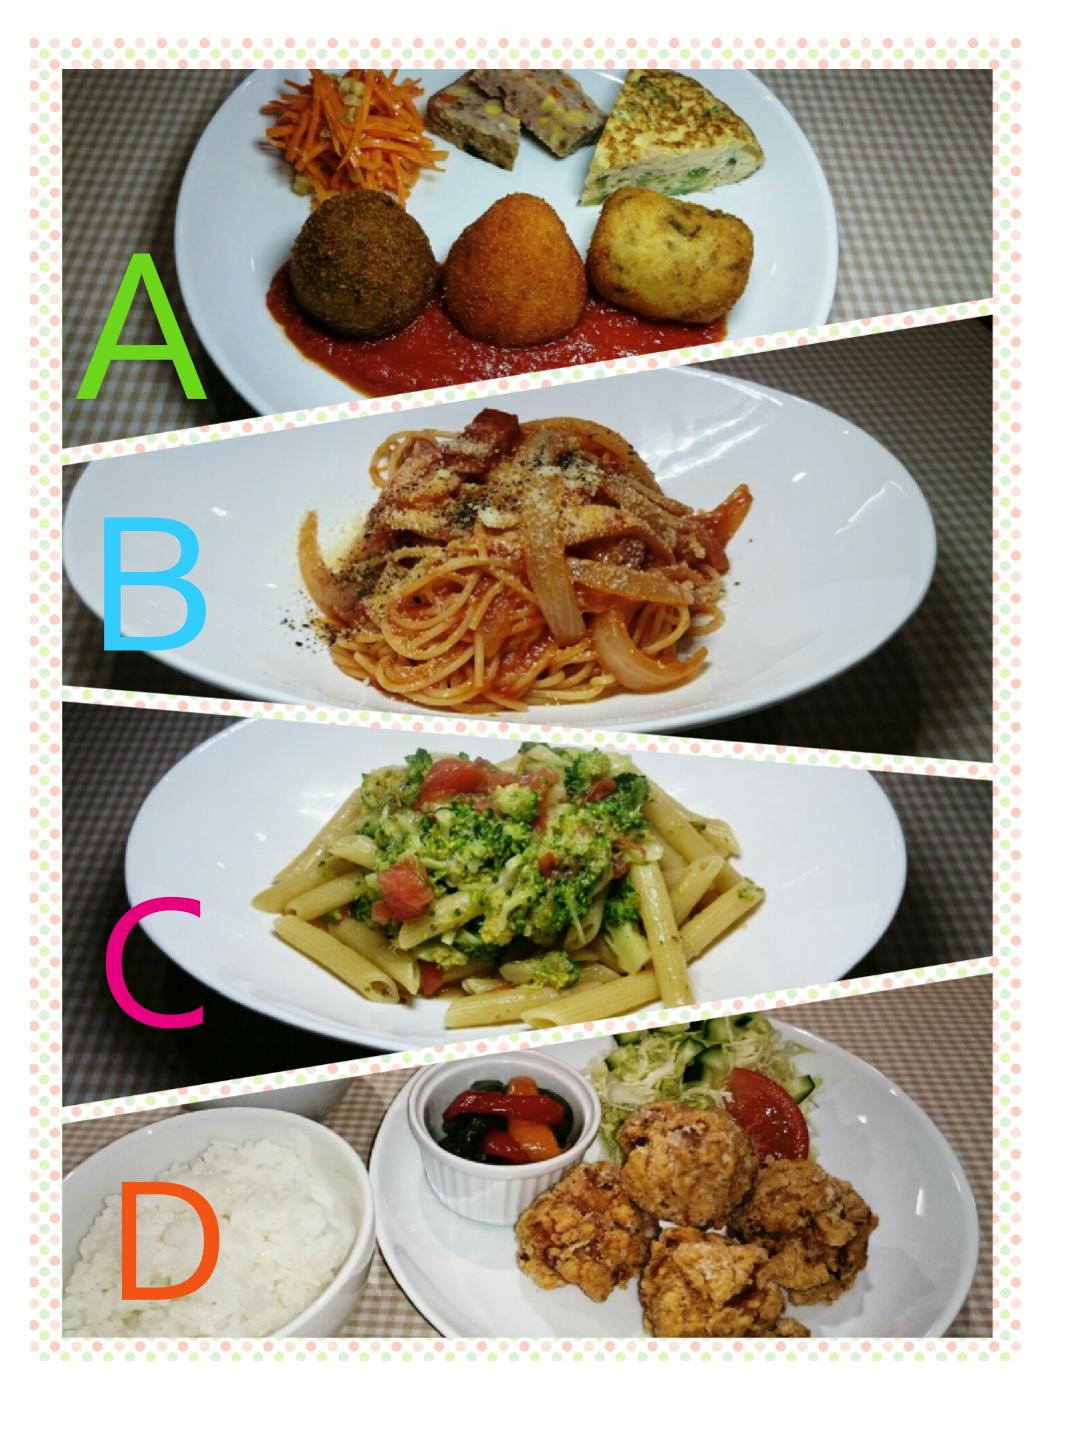 tunanuts ランチ 食事 アランチーニ・パスタ・カレー・定食の写真